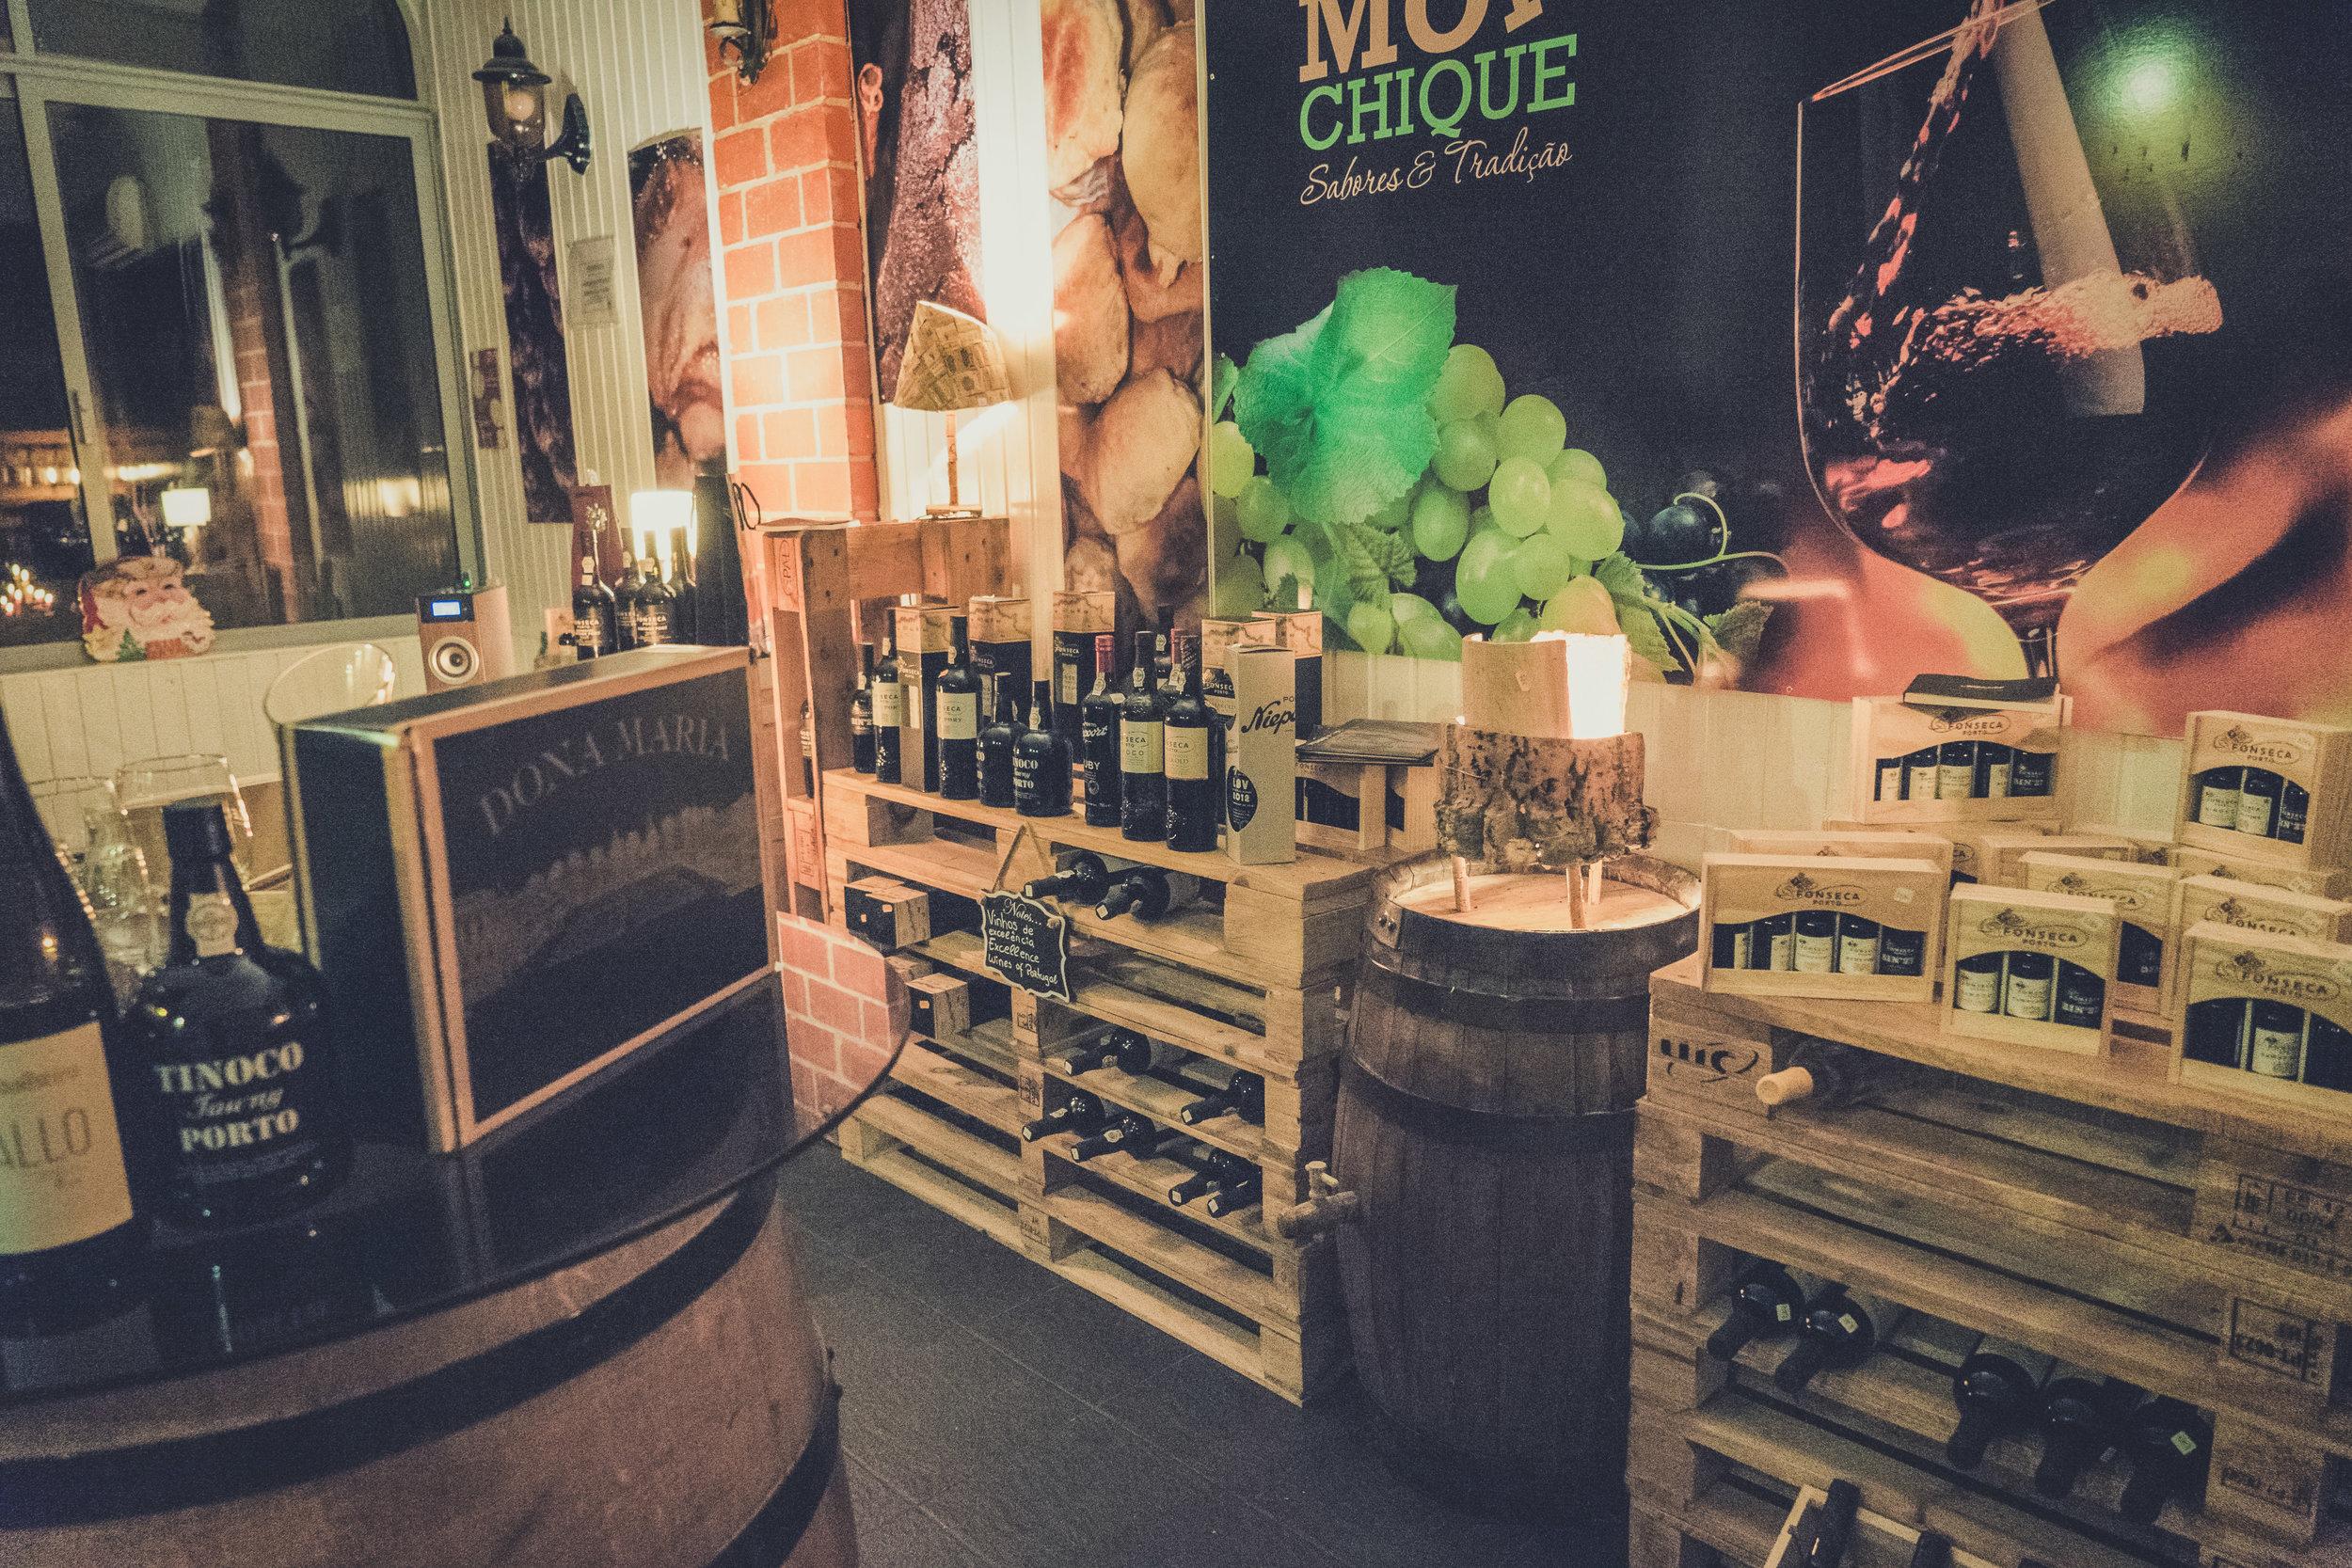 monchique portugal restaurante luar da foia. good food in monchique. fun times. wine celler. port celler. wine shop. great wine.jpg